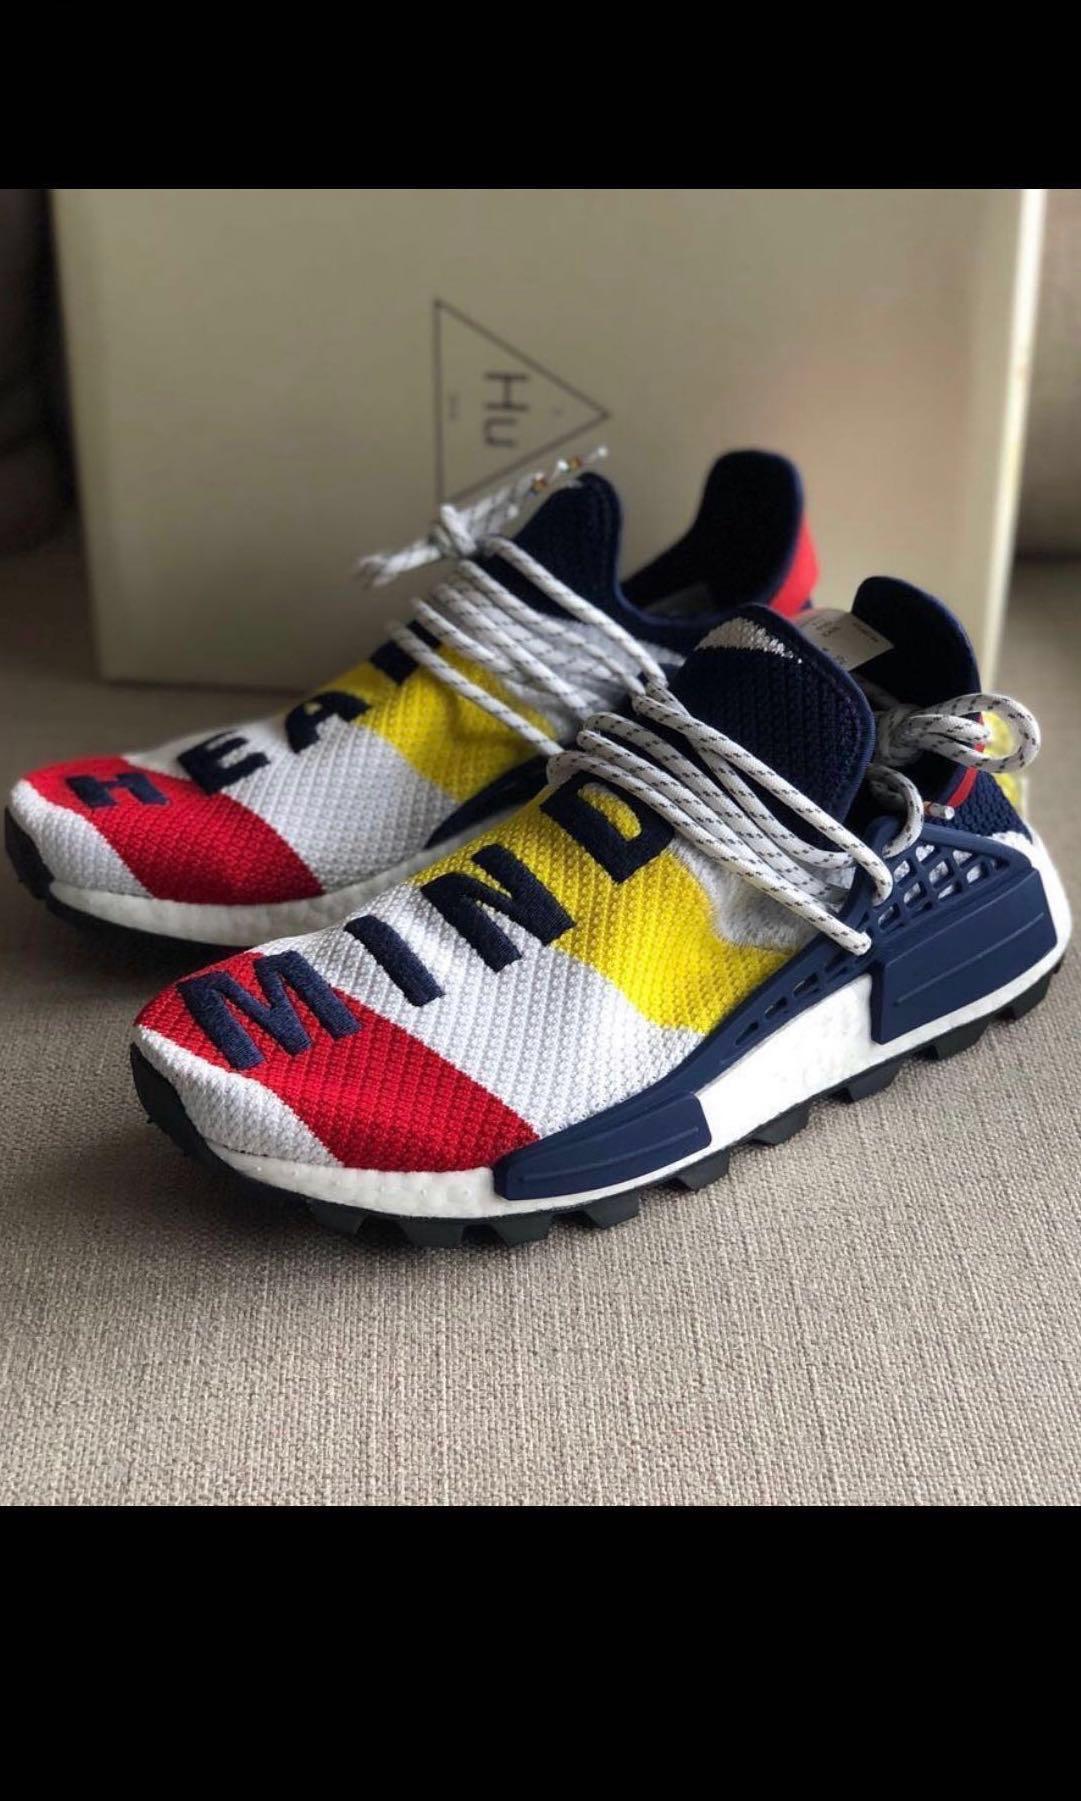 new arrival 7cd3a a442a BBC x Adidas NMD X Pharrell Williams Human Race Multi Color ...